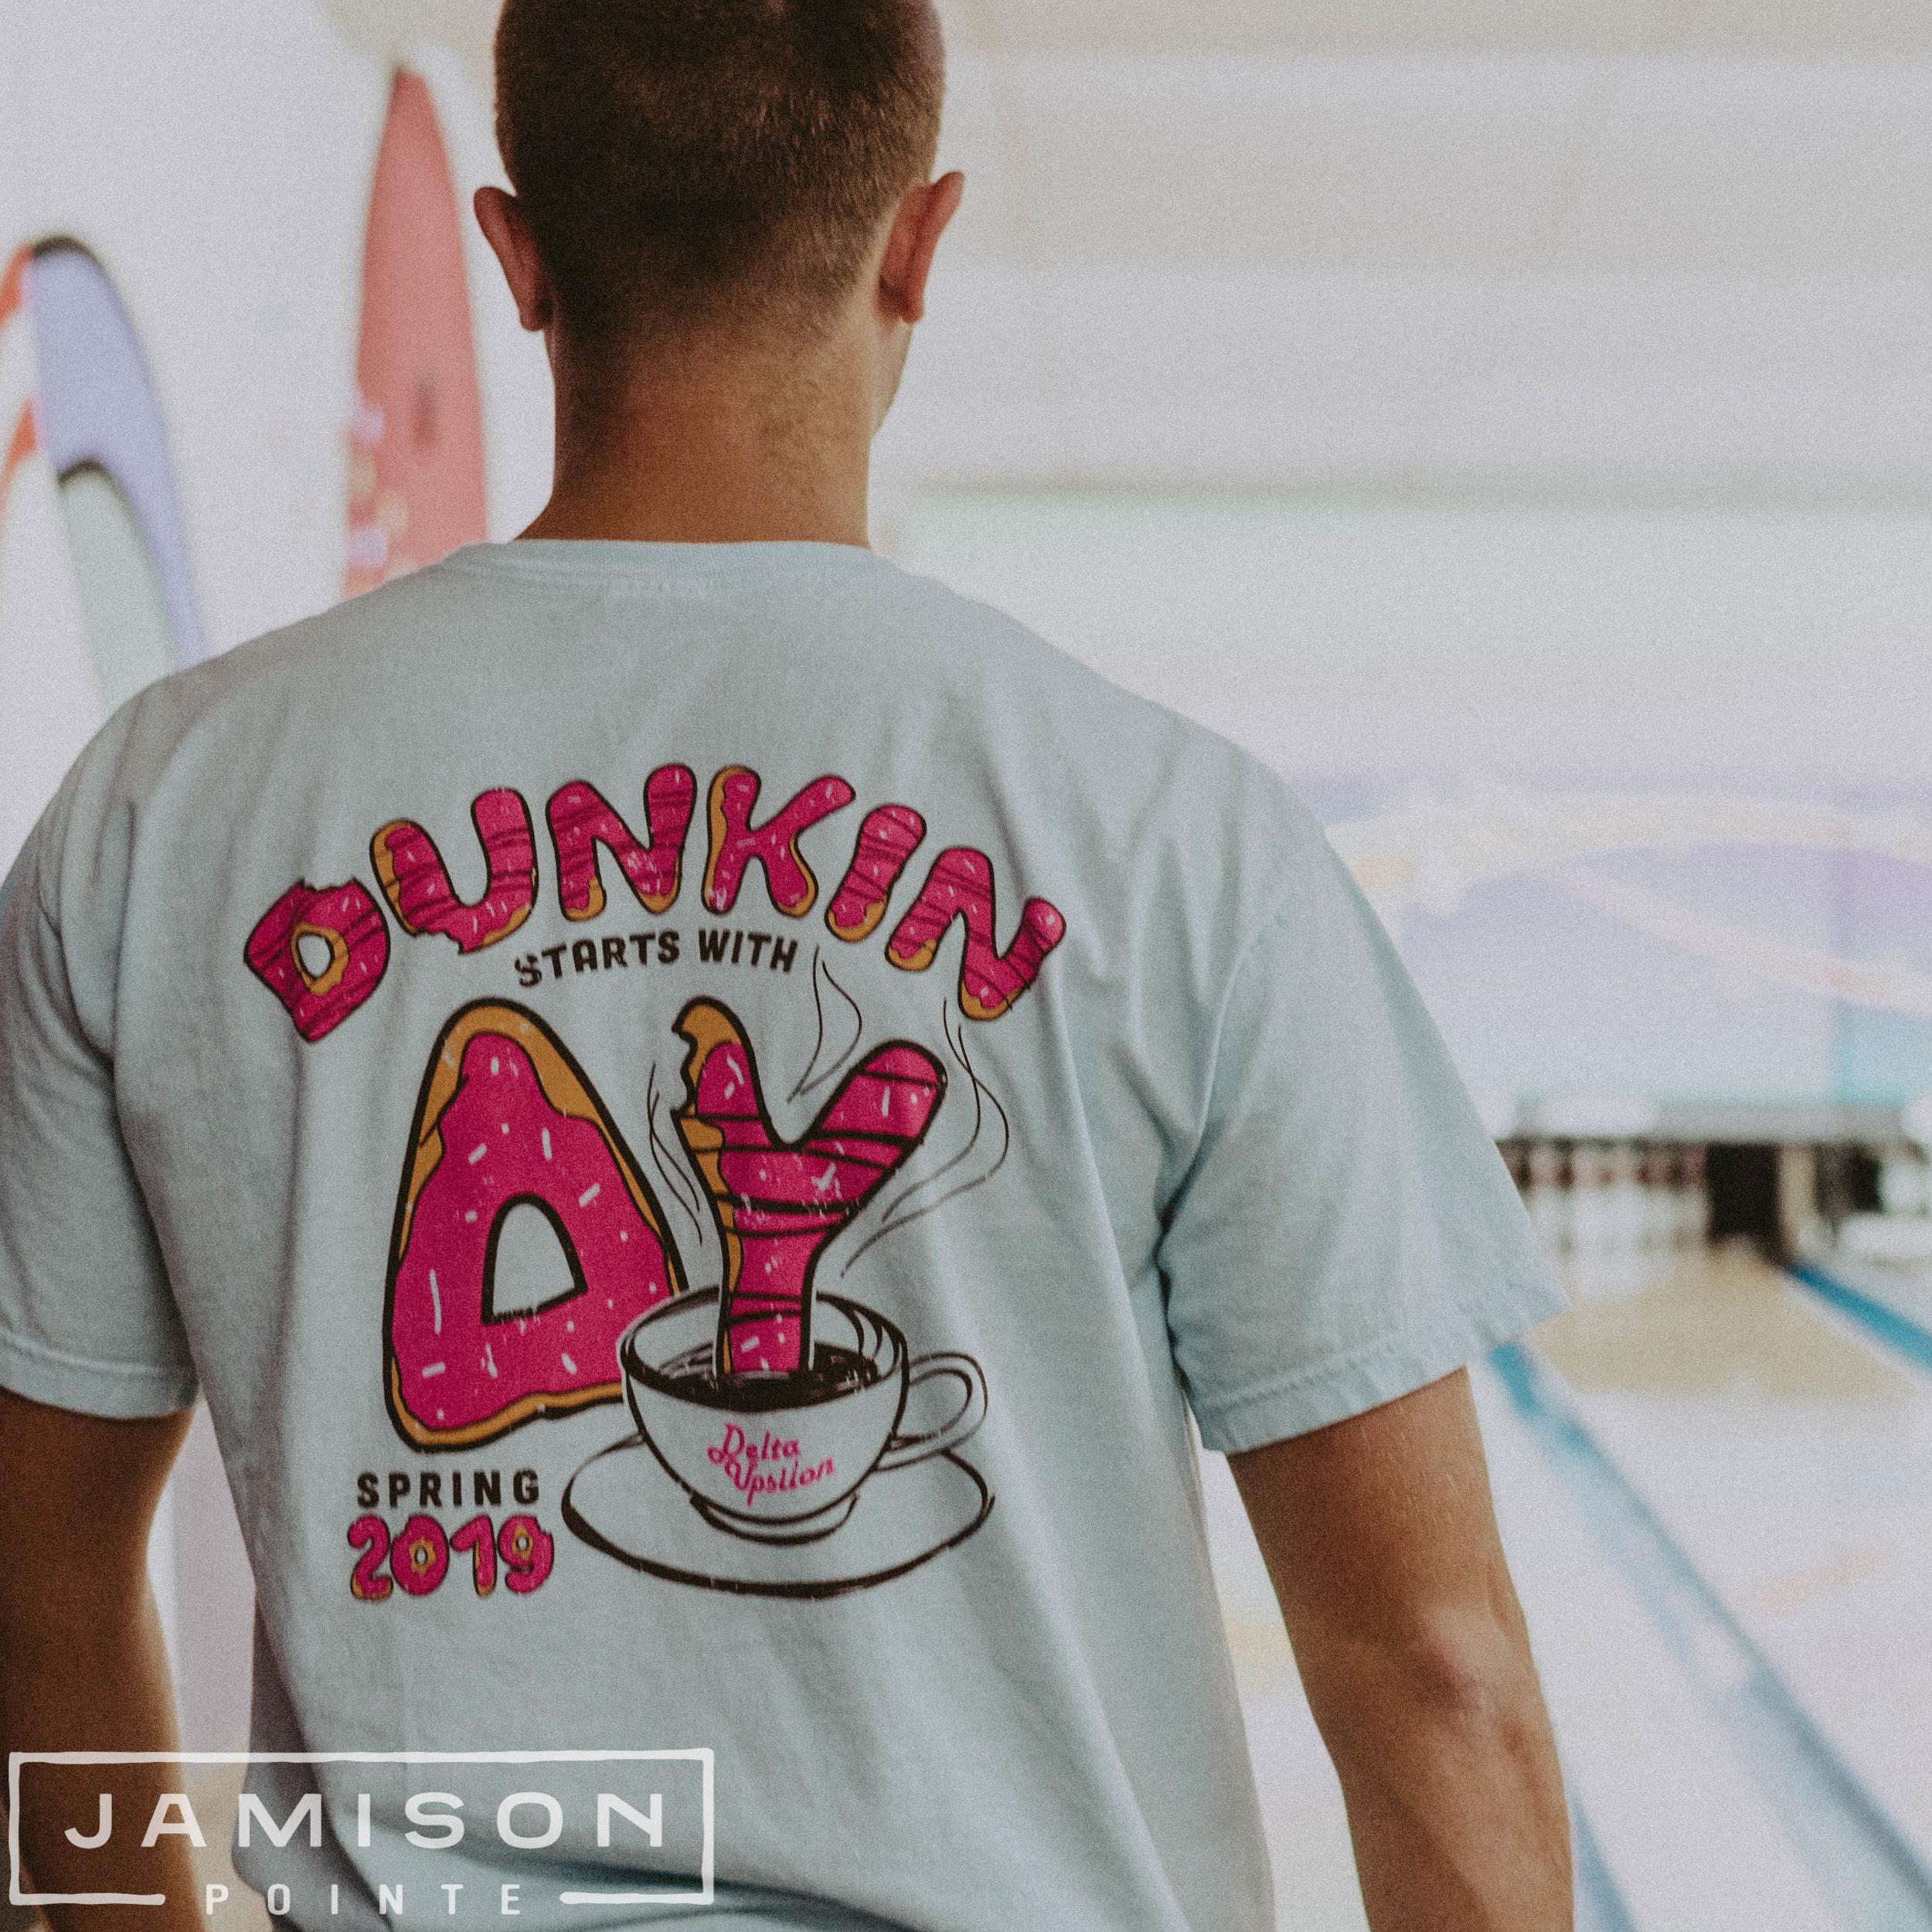 Delta Upsilon Dunkin T-shirt